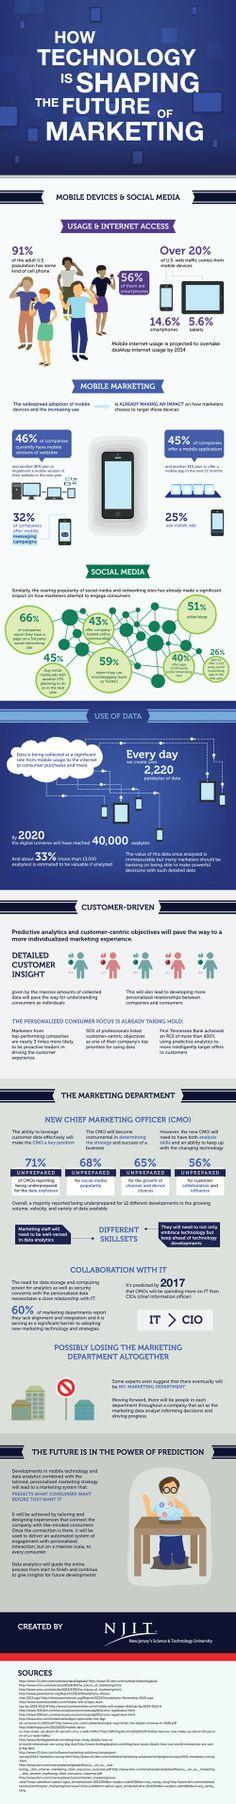 NJIT-technology-shaping-marketing.jpg.aspx (500×3823)